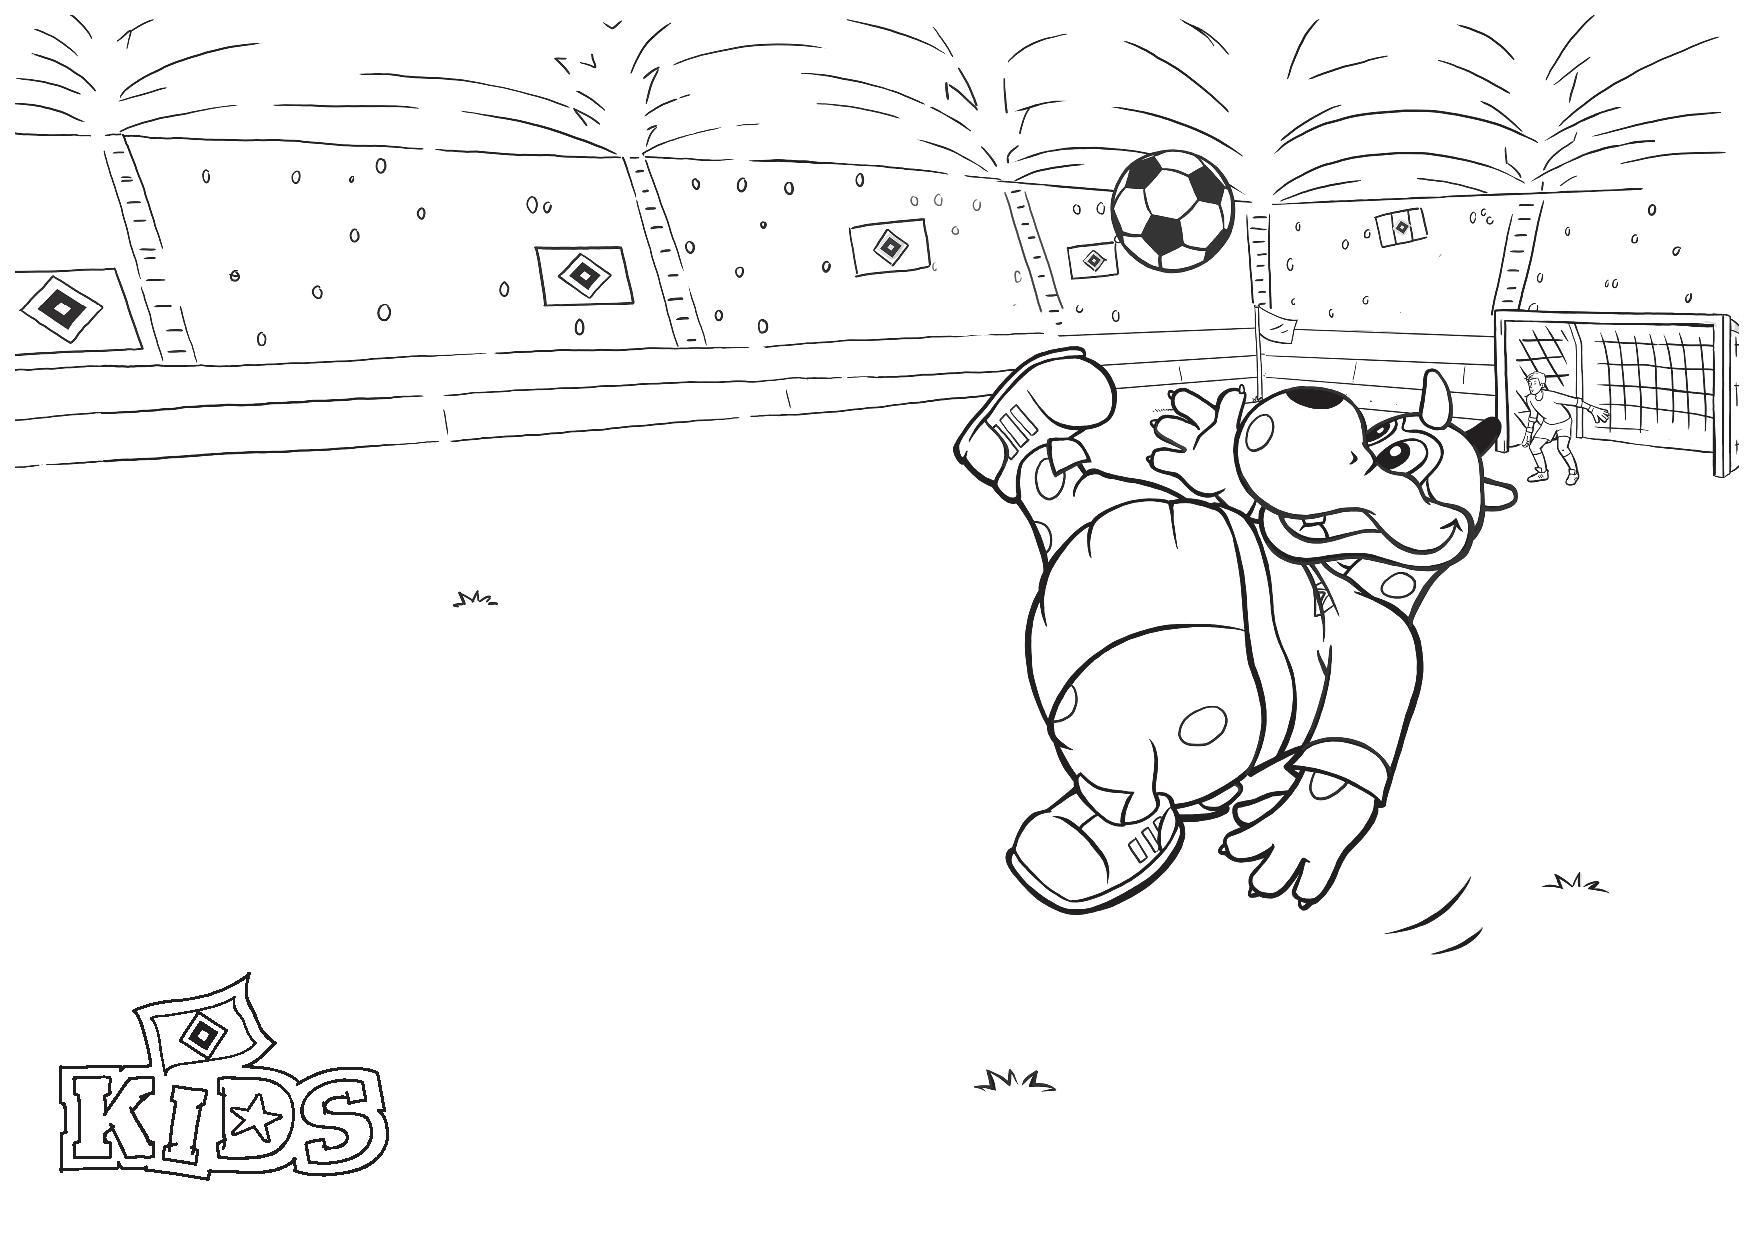 fußball bundesliga ausmalbilder / malvorlagen fussball rb